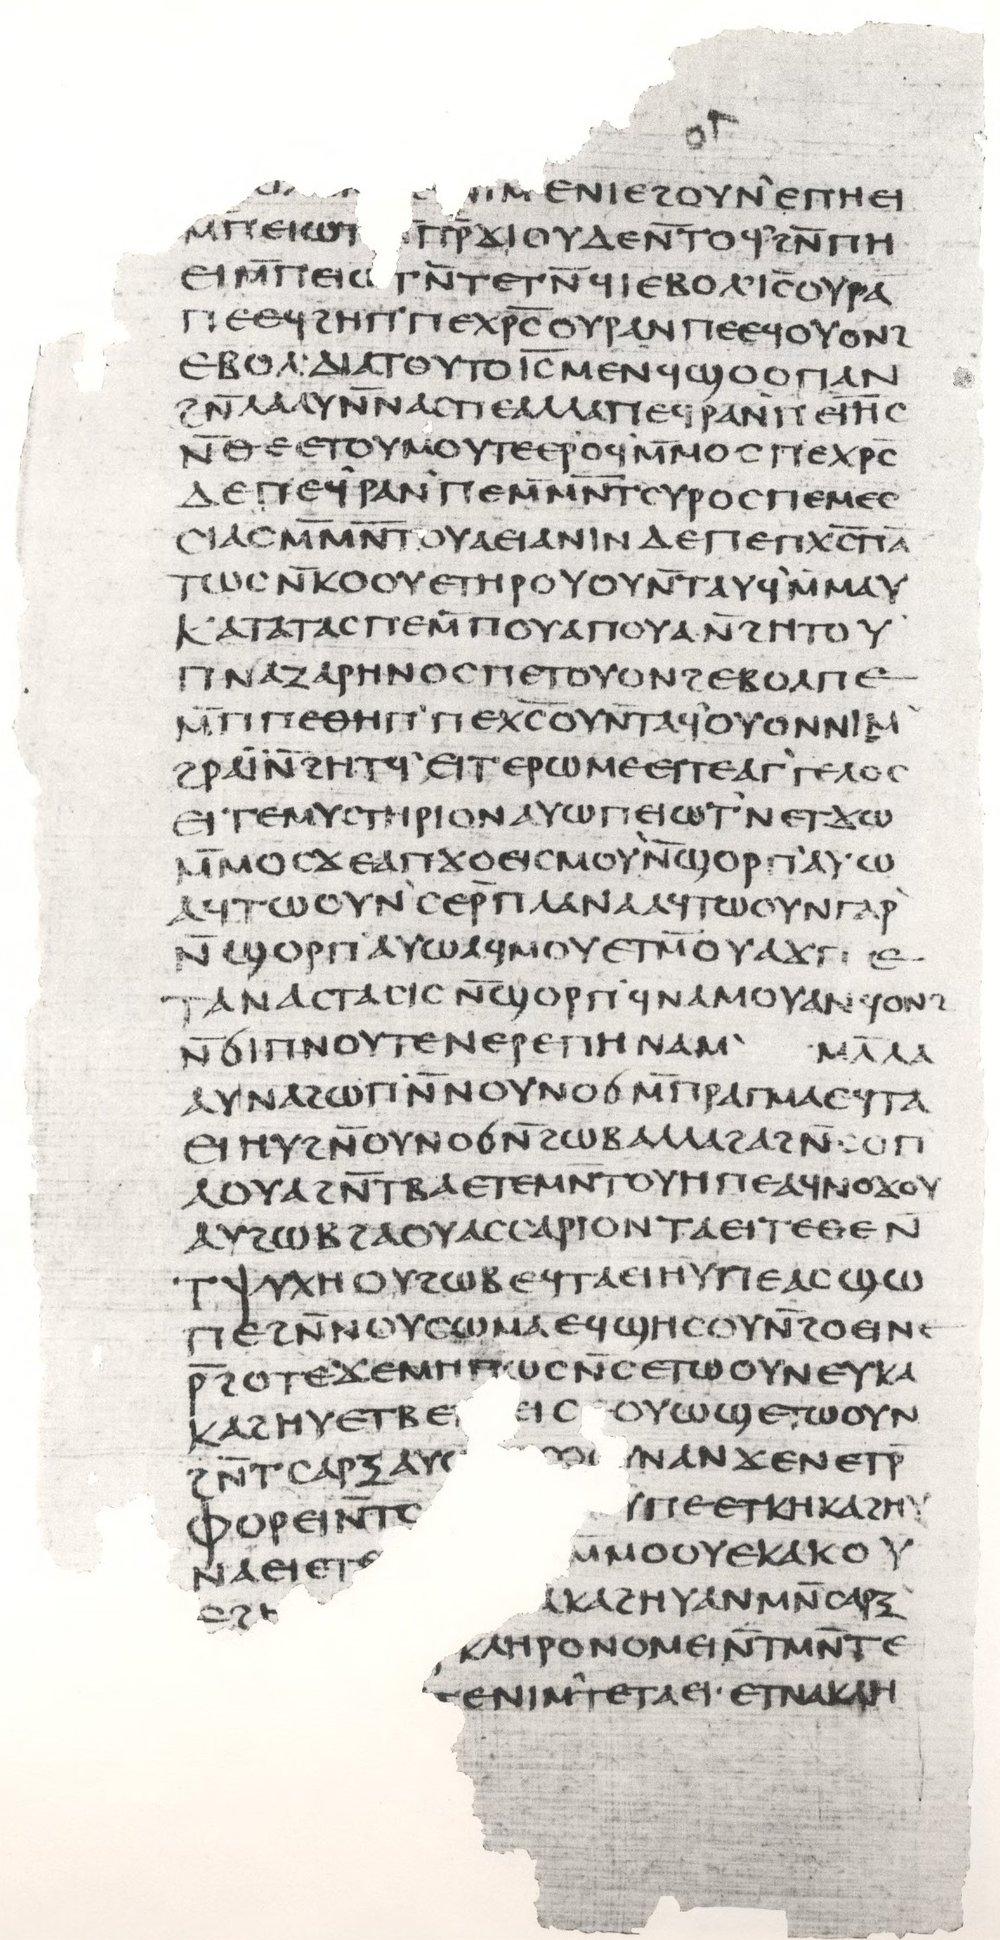 Gospel_of_Philip_facsimile_Page_56.jpg